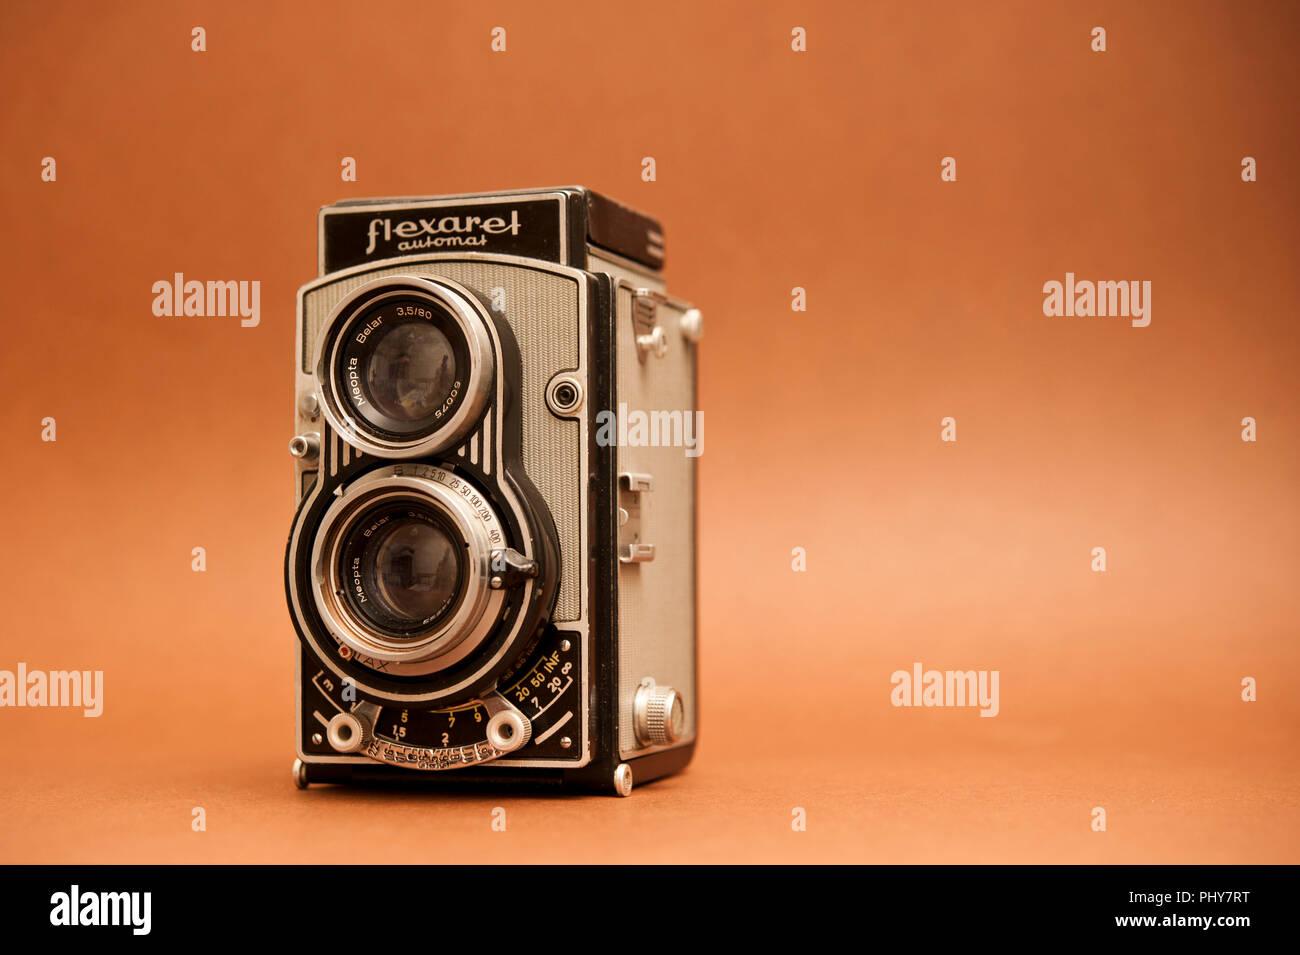 Flexaret Automat TLR Fotocamera Immagini Stock